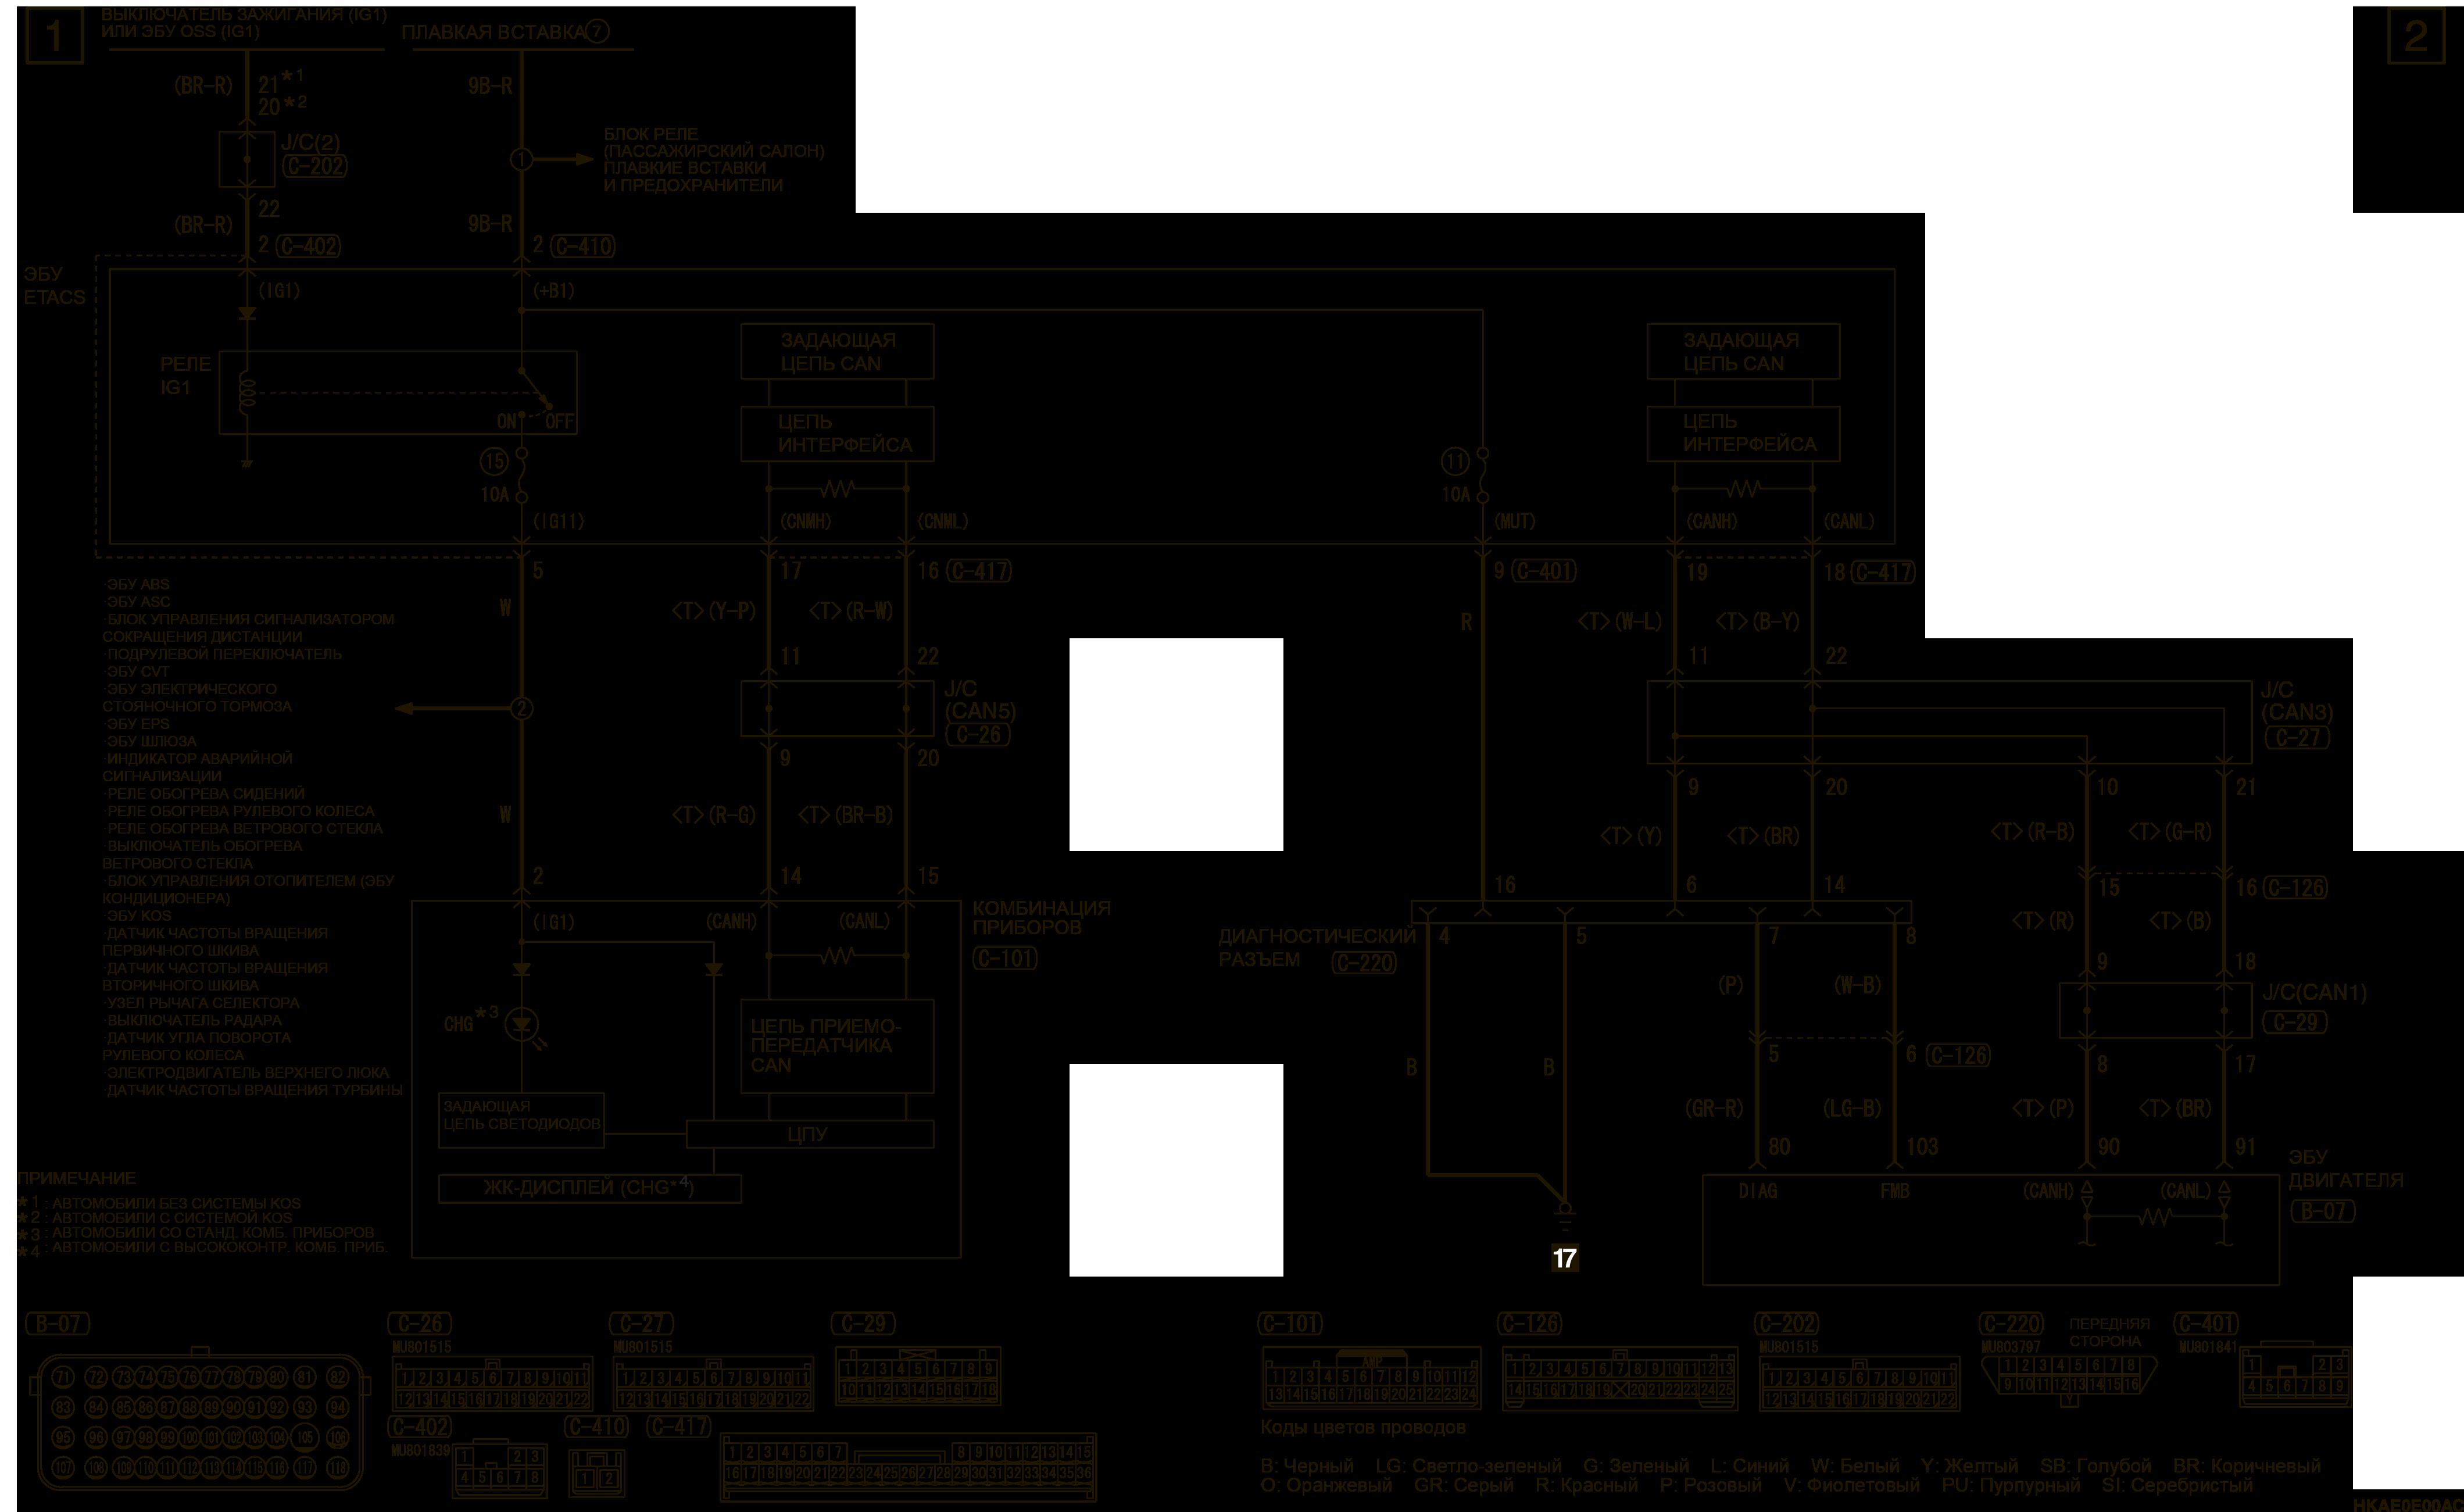 mmc аутлендер 3 2019 электросхемаСИСТЕМА ЭЛЕКТРОСНАБЖЕНИЯ 4B1 (ЛЕВАЯ)